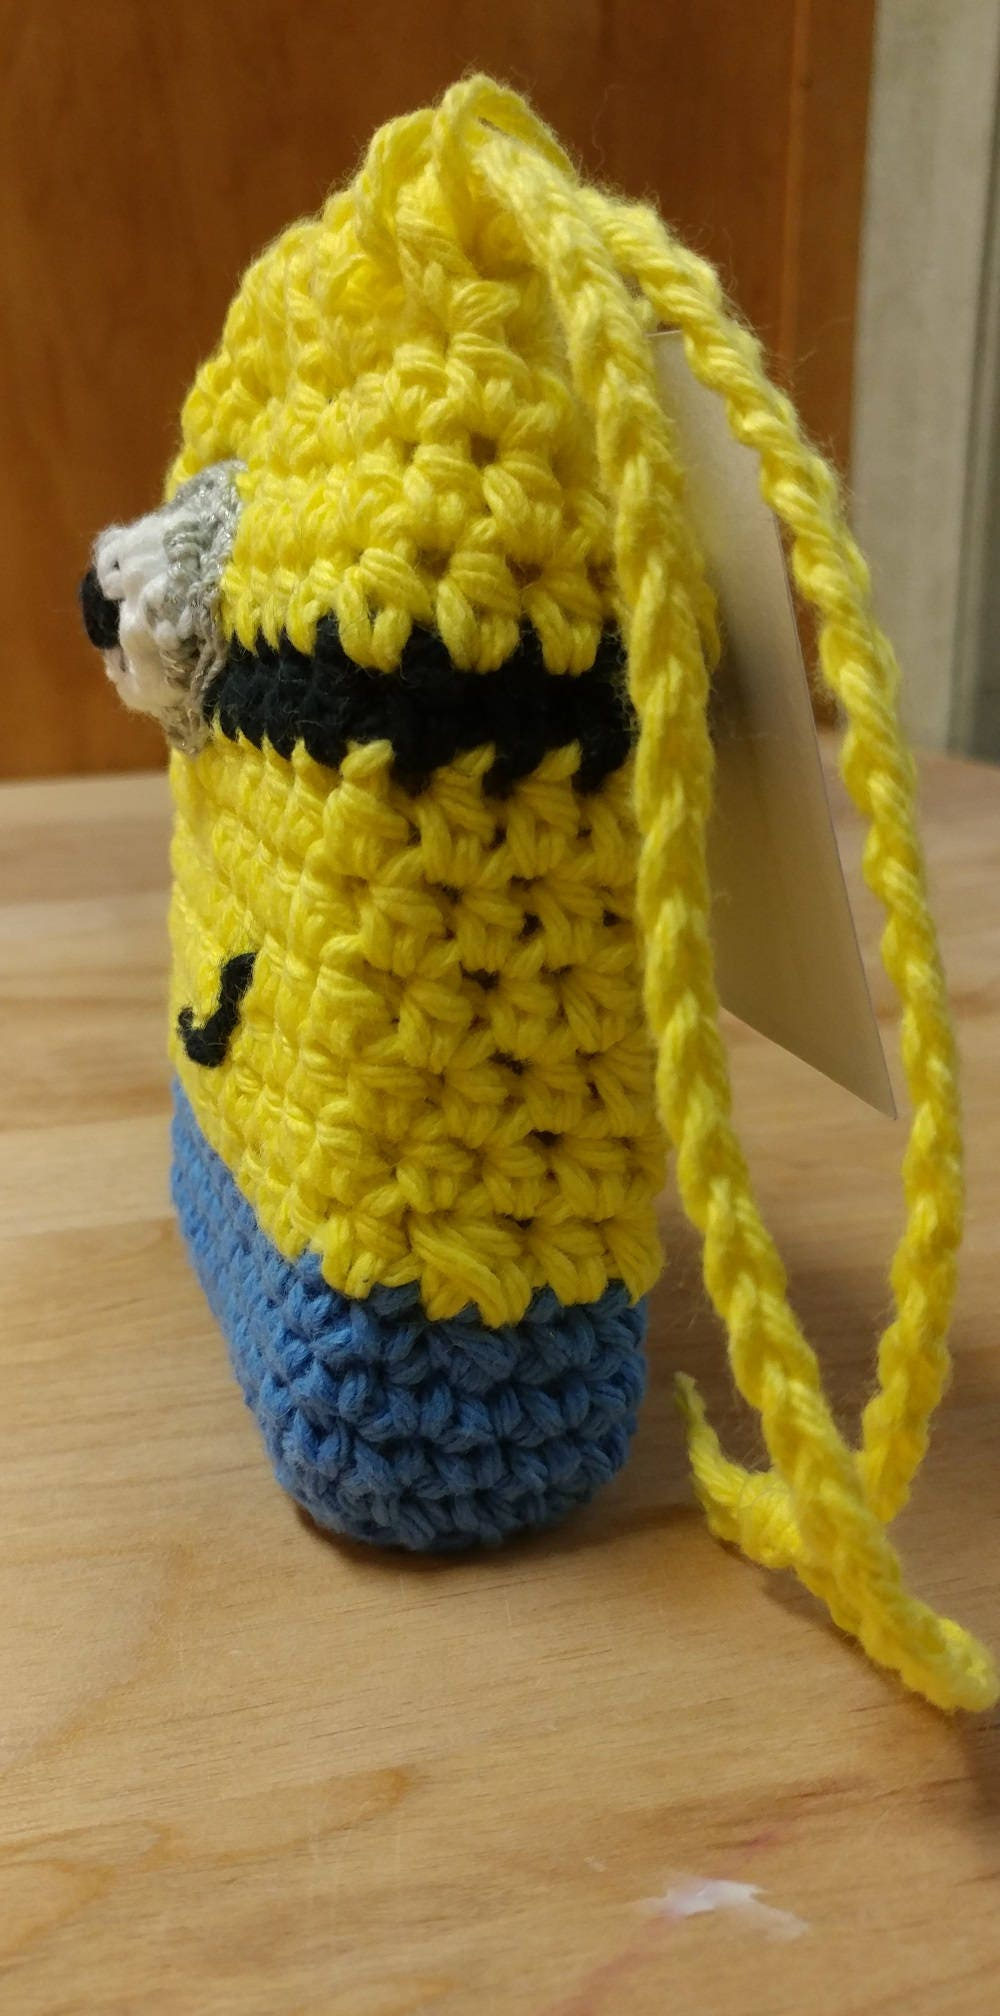 Handmade Cotton Despicable Me Minion Soap Saver Crochet Cotton